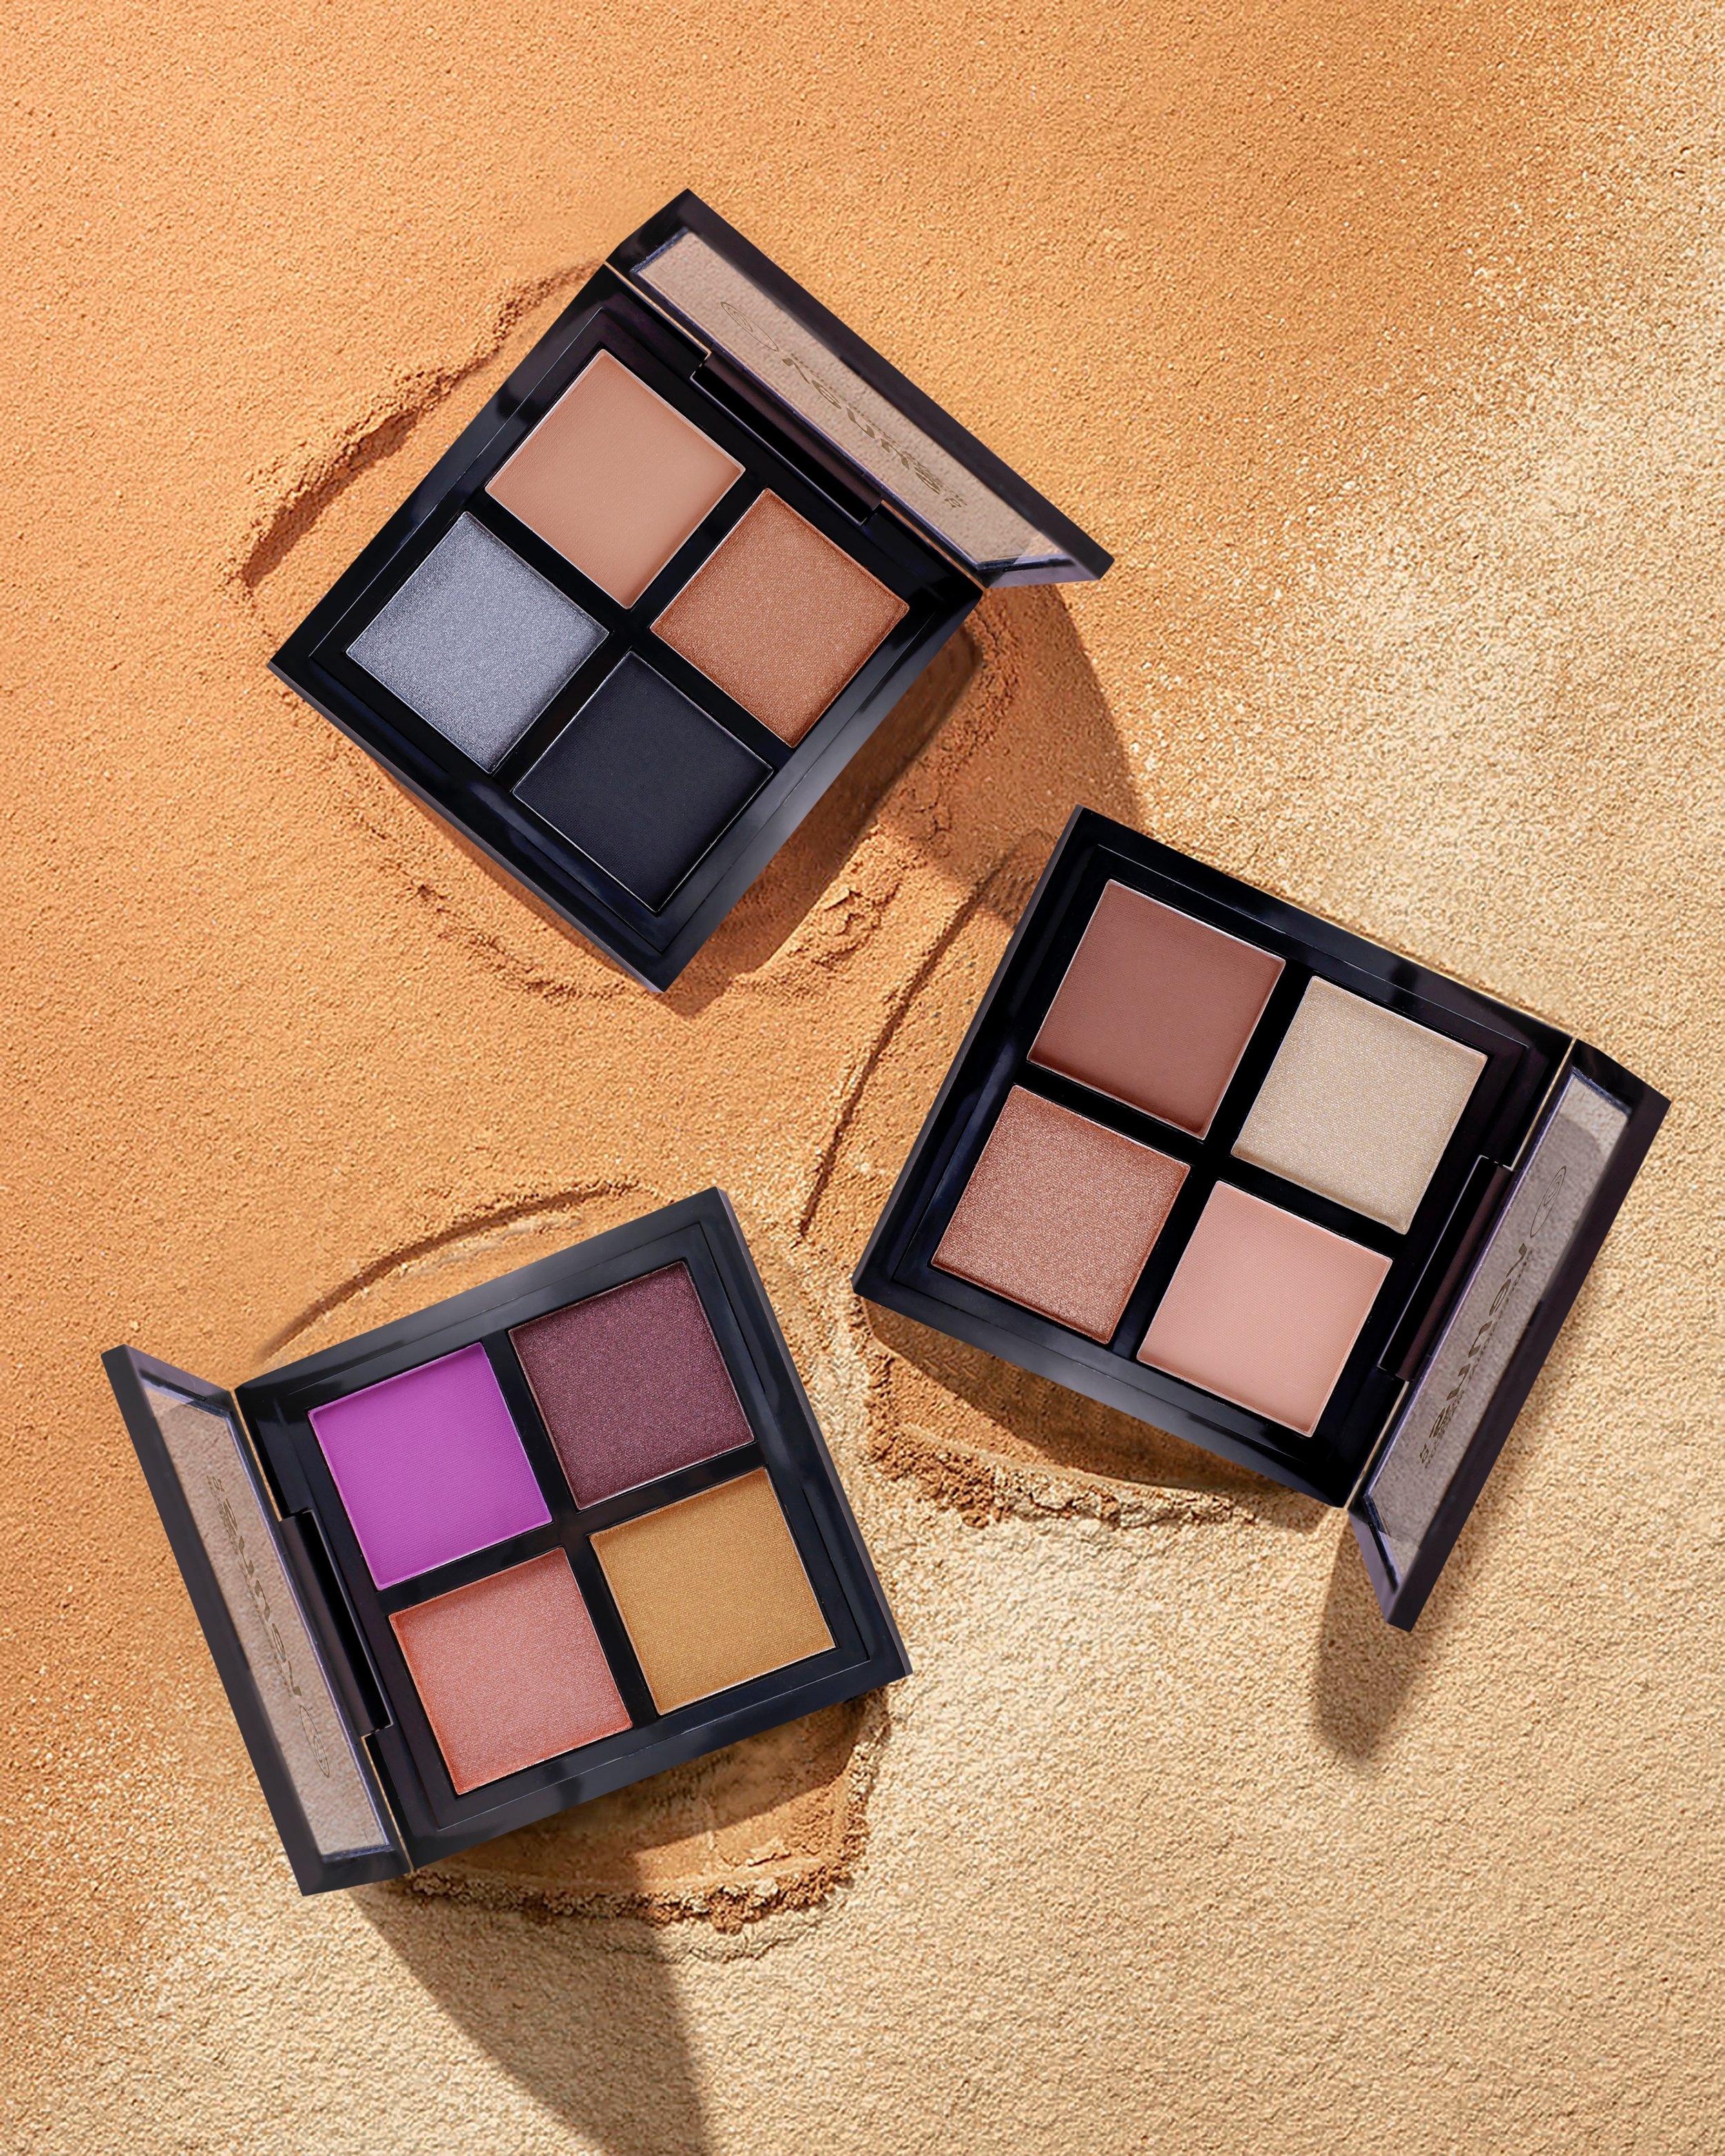 color-compact-cosmetics-2639947.jpg